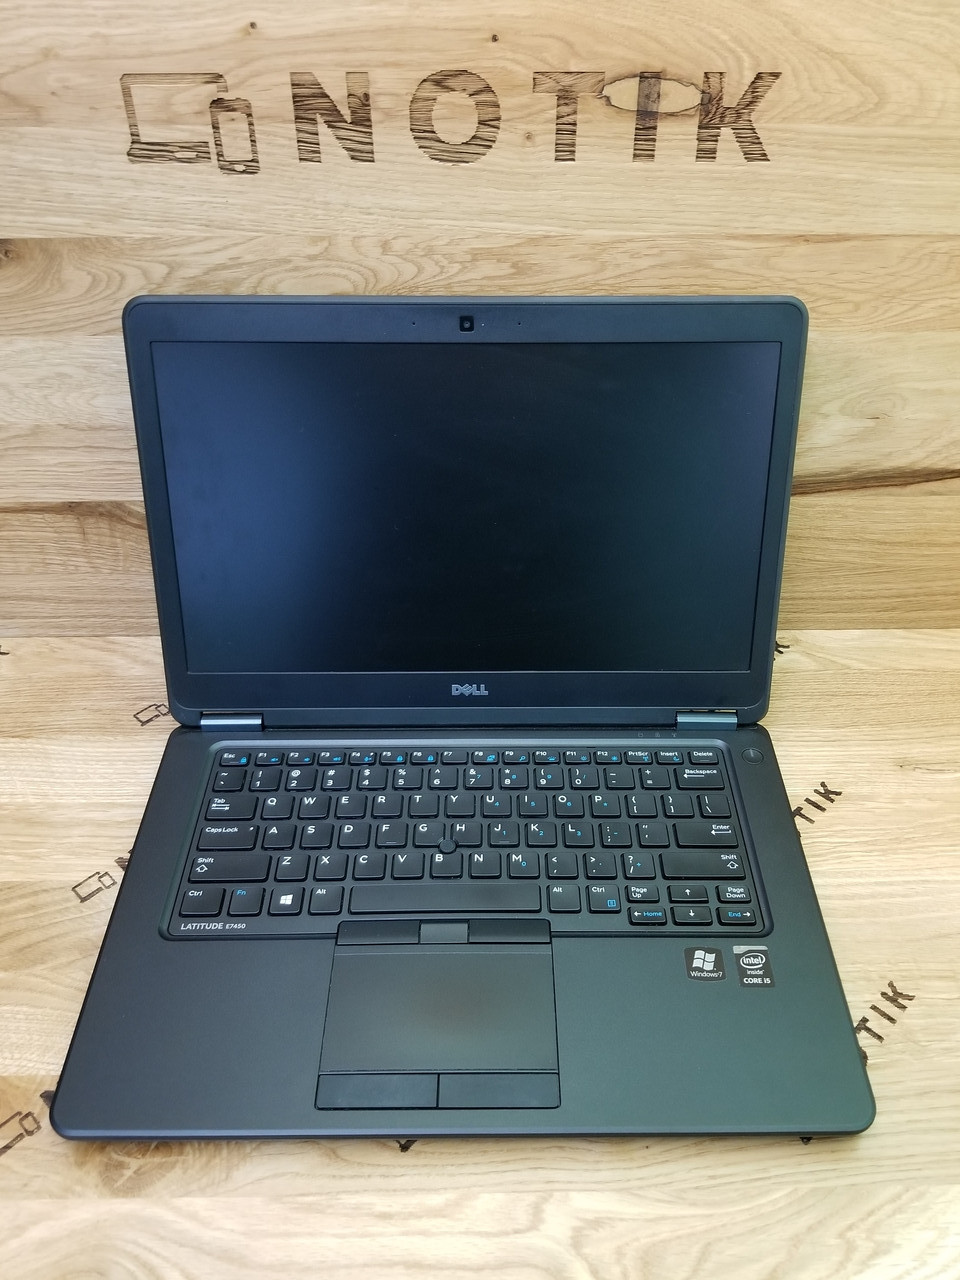 Ультрабук Dell Latitude E7450 I5, 8gb, 256ssd (ГАРАНТІЯ)